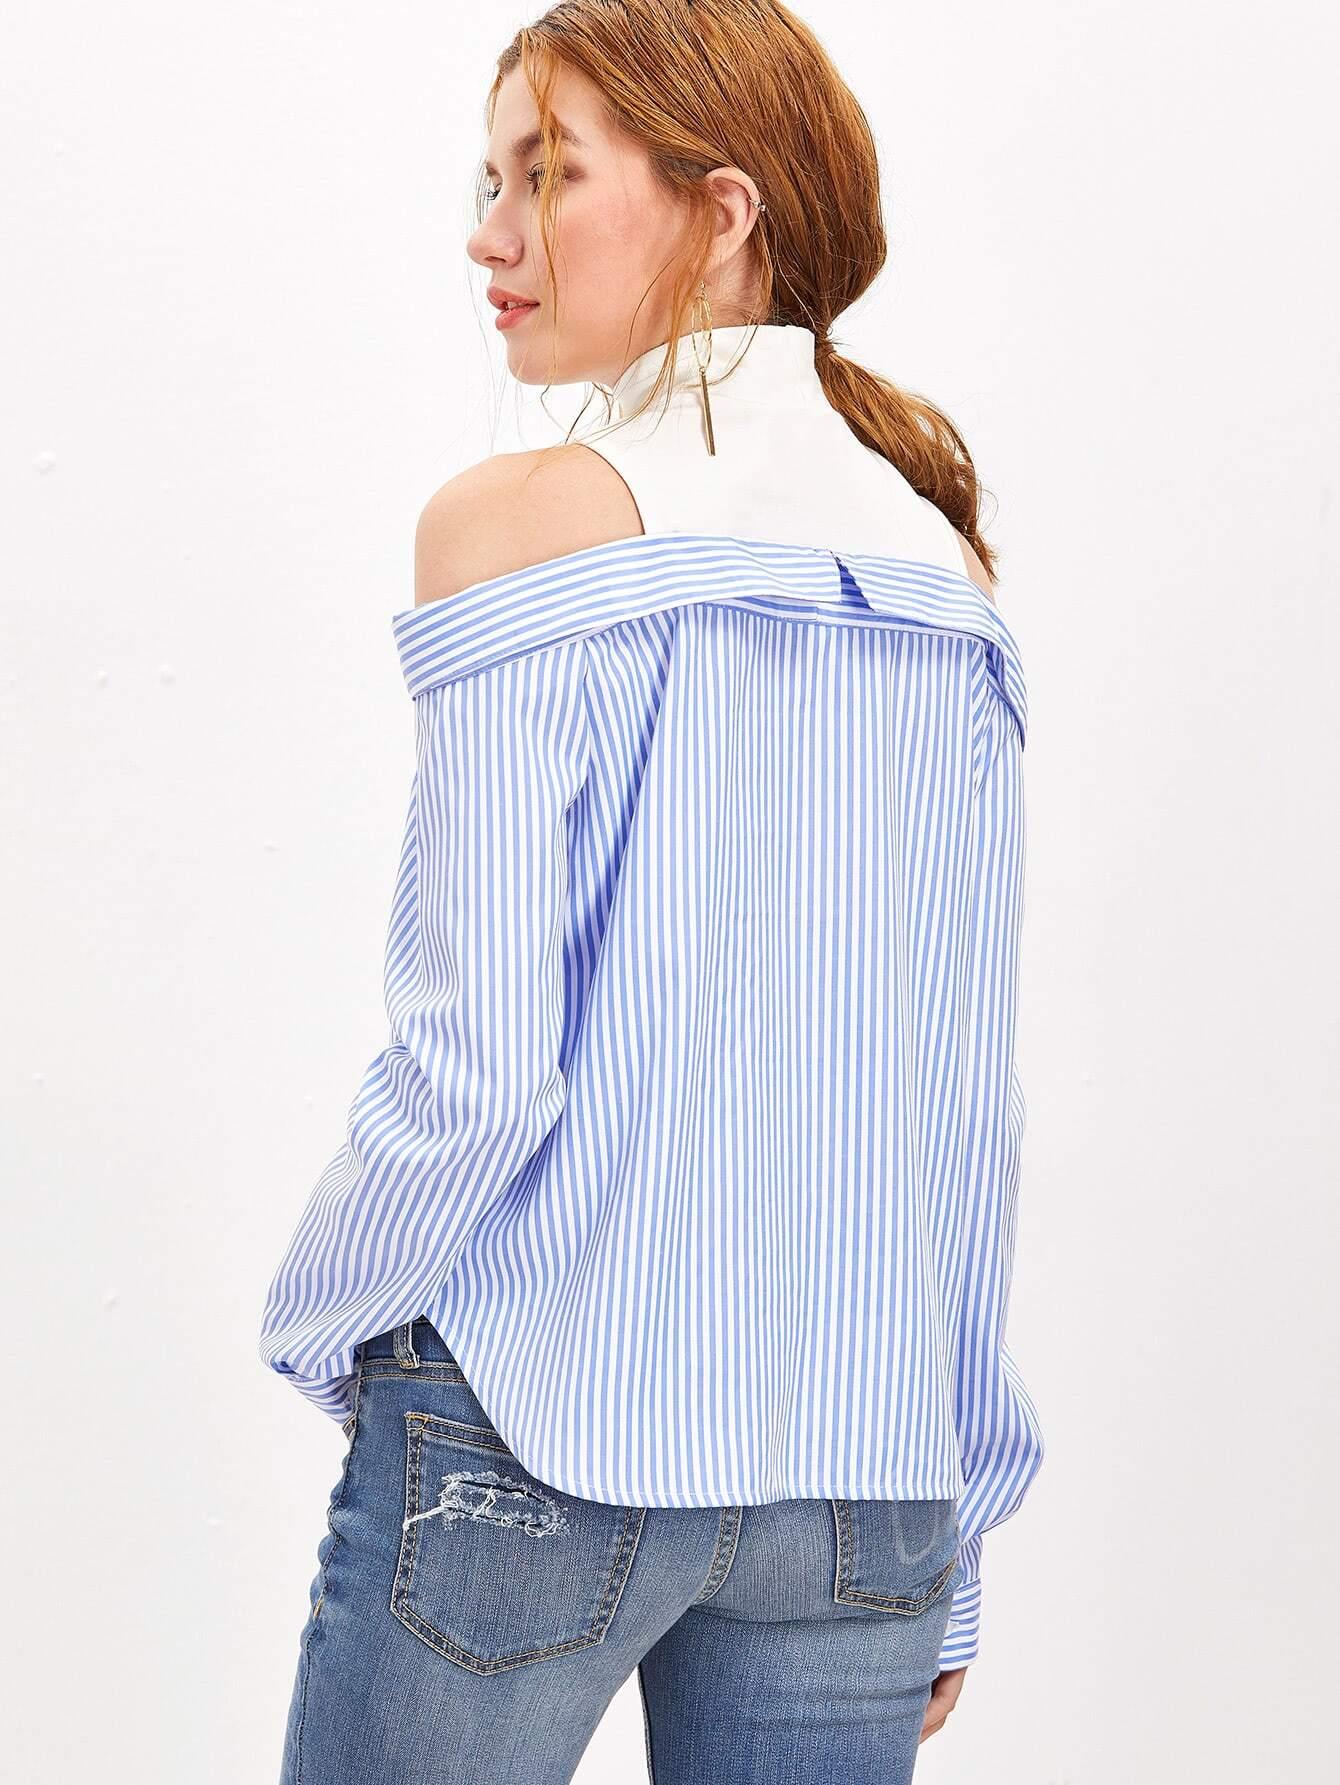 blouse161205714_2